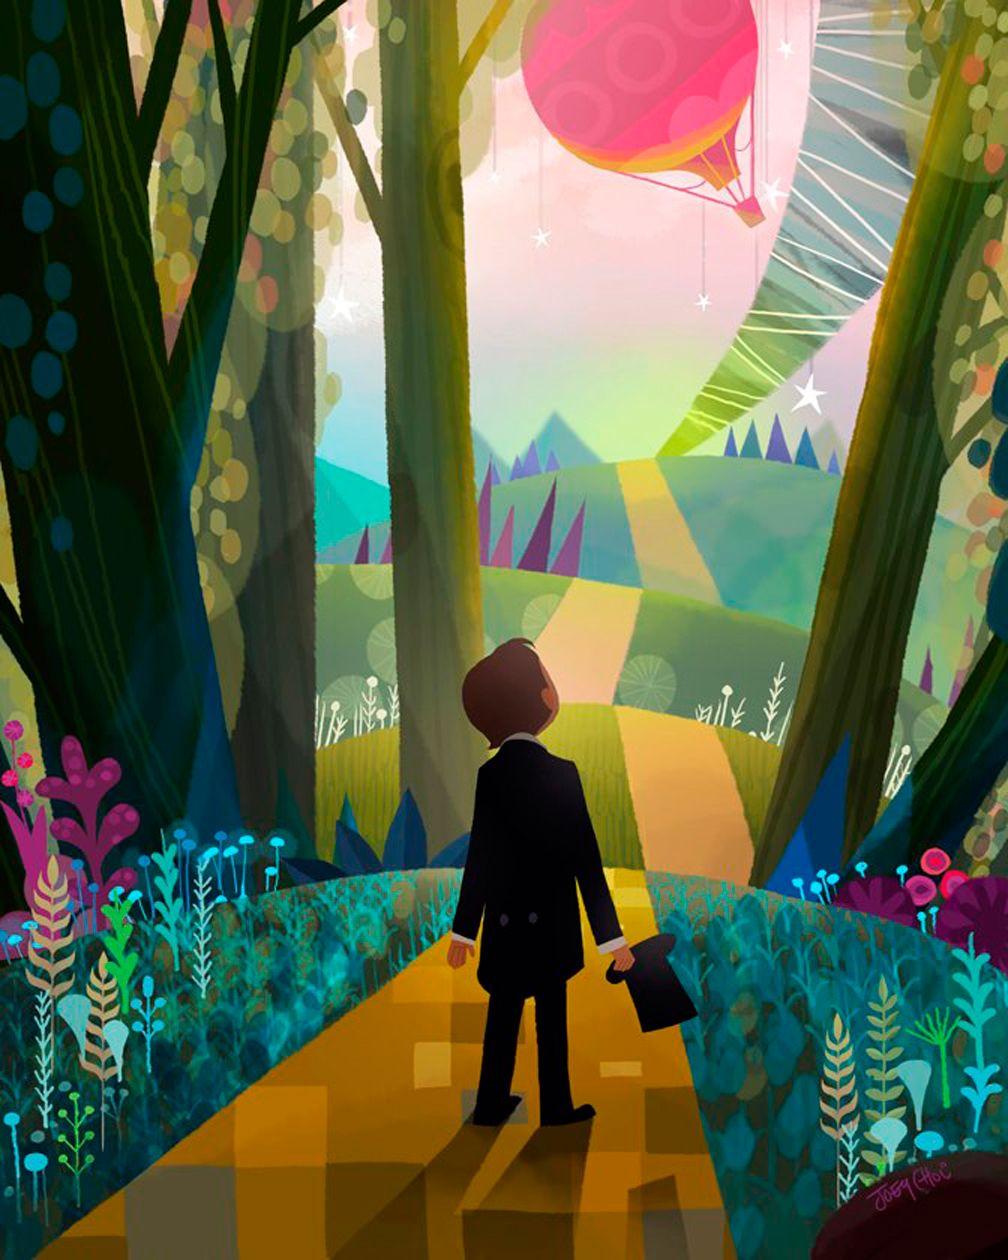 Art Of Animation - Joey Chou Illustration